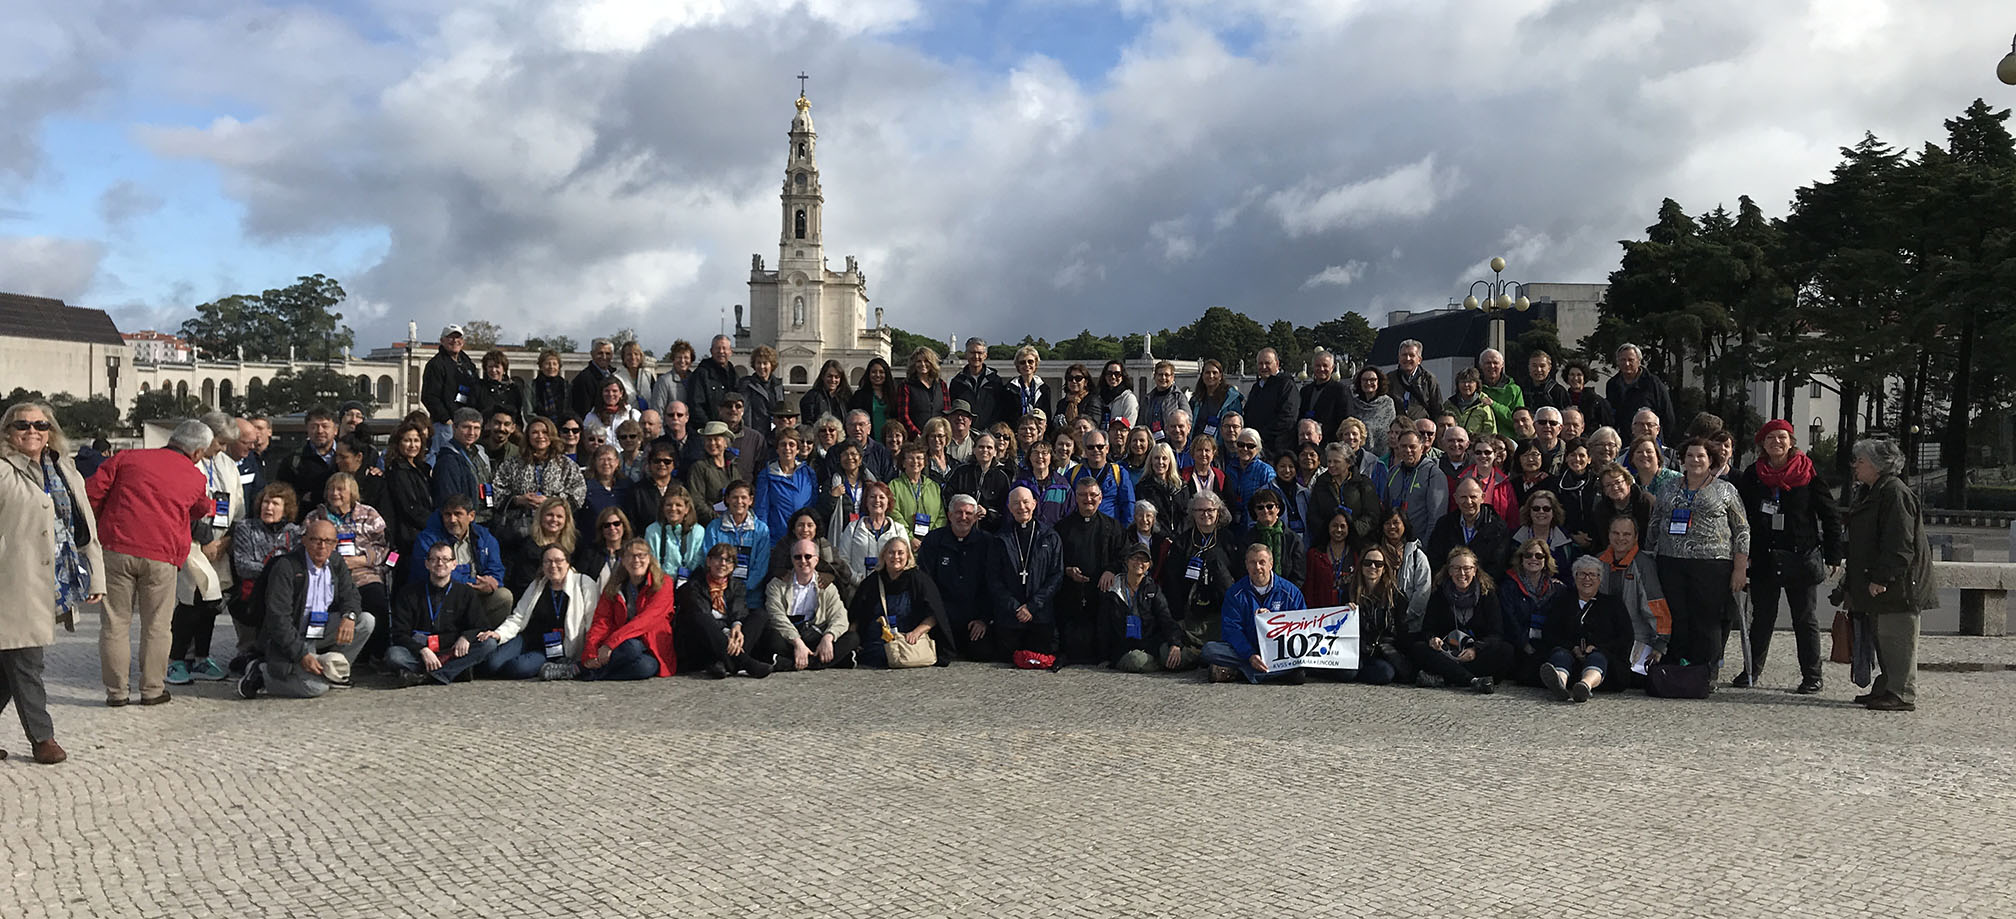 Pilgrimage Group photo - Fatima/Lourdes